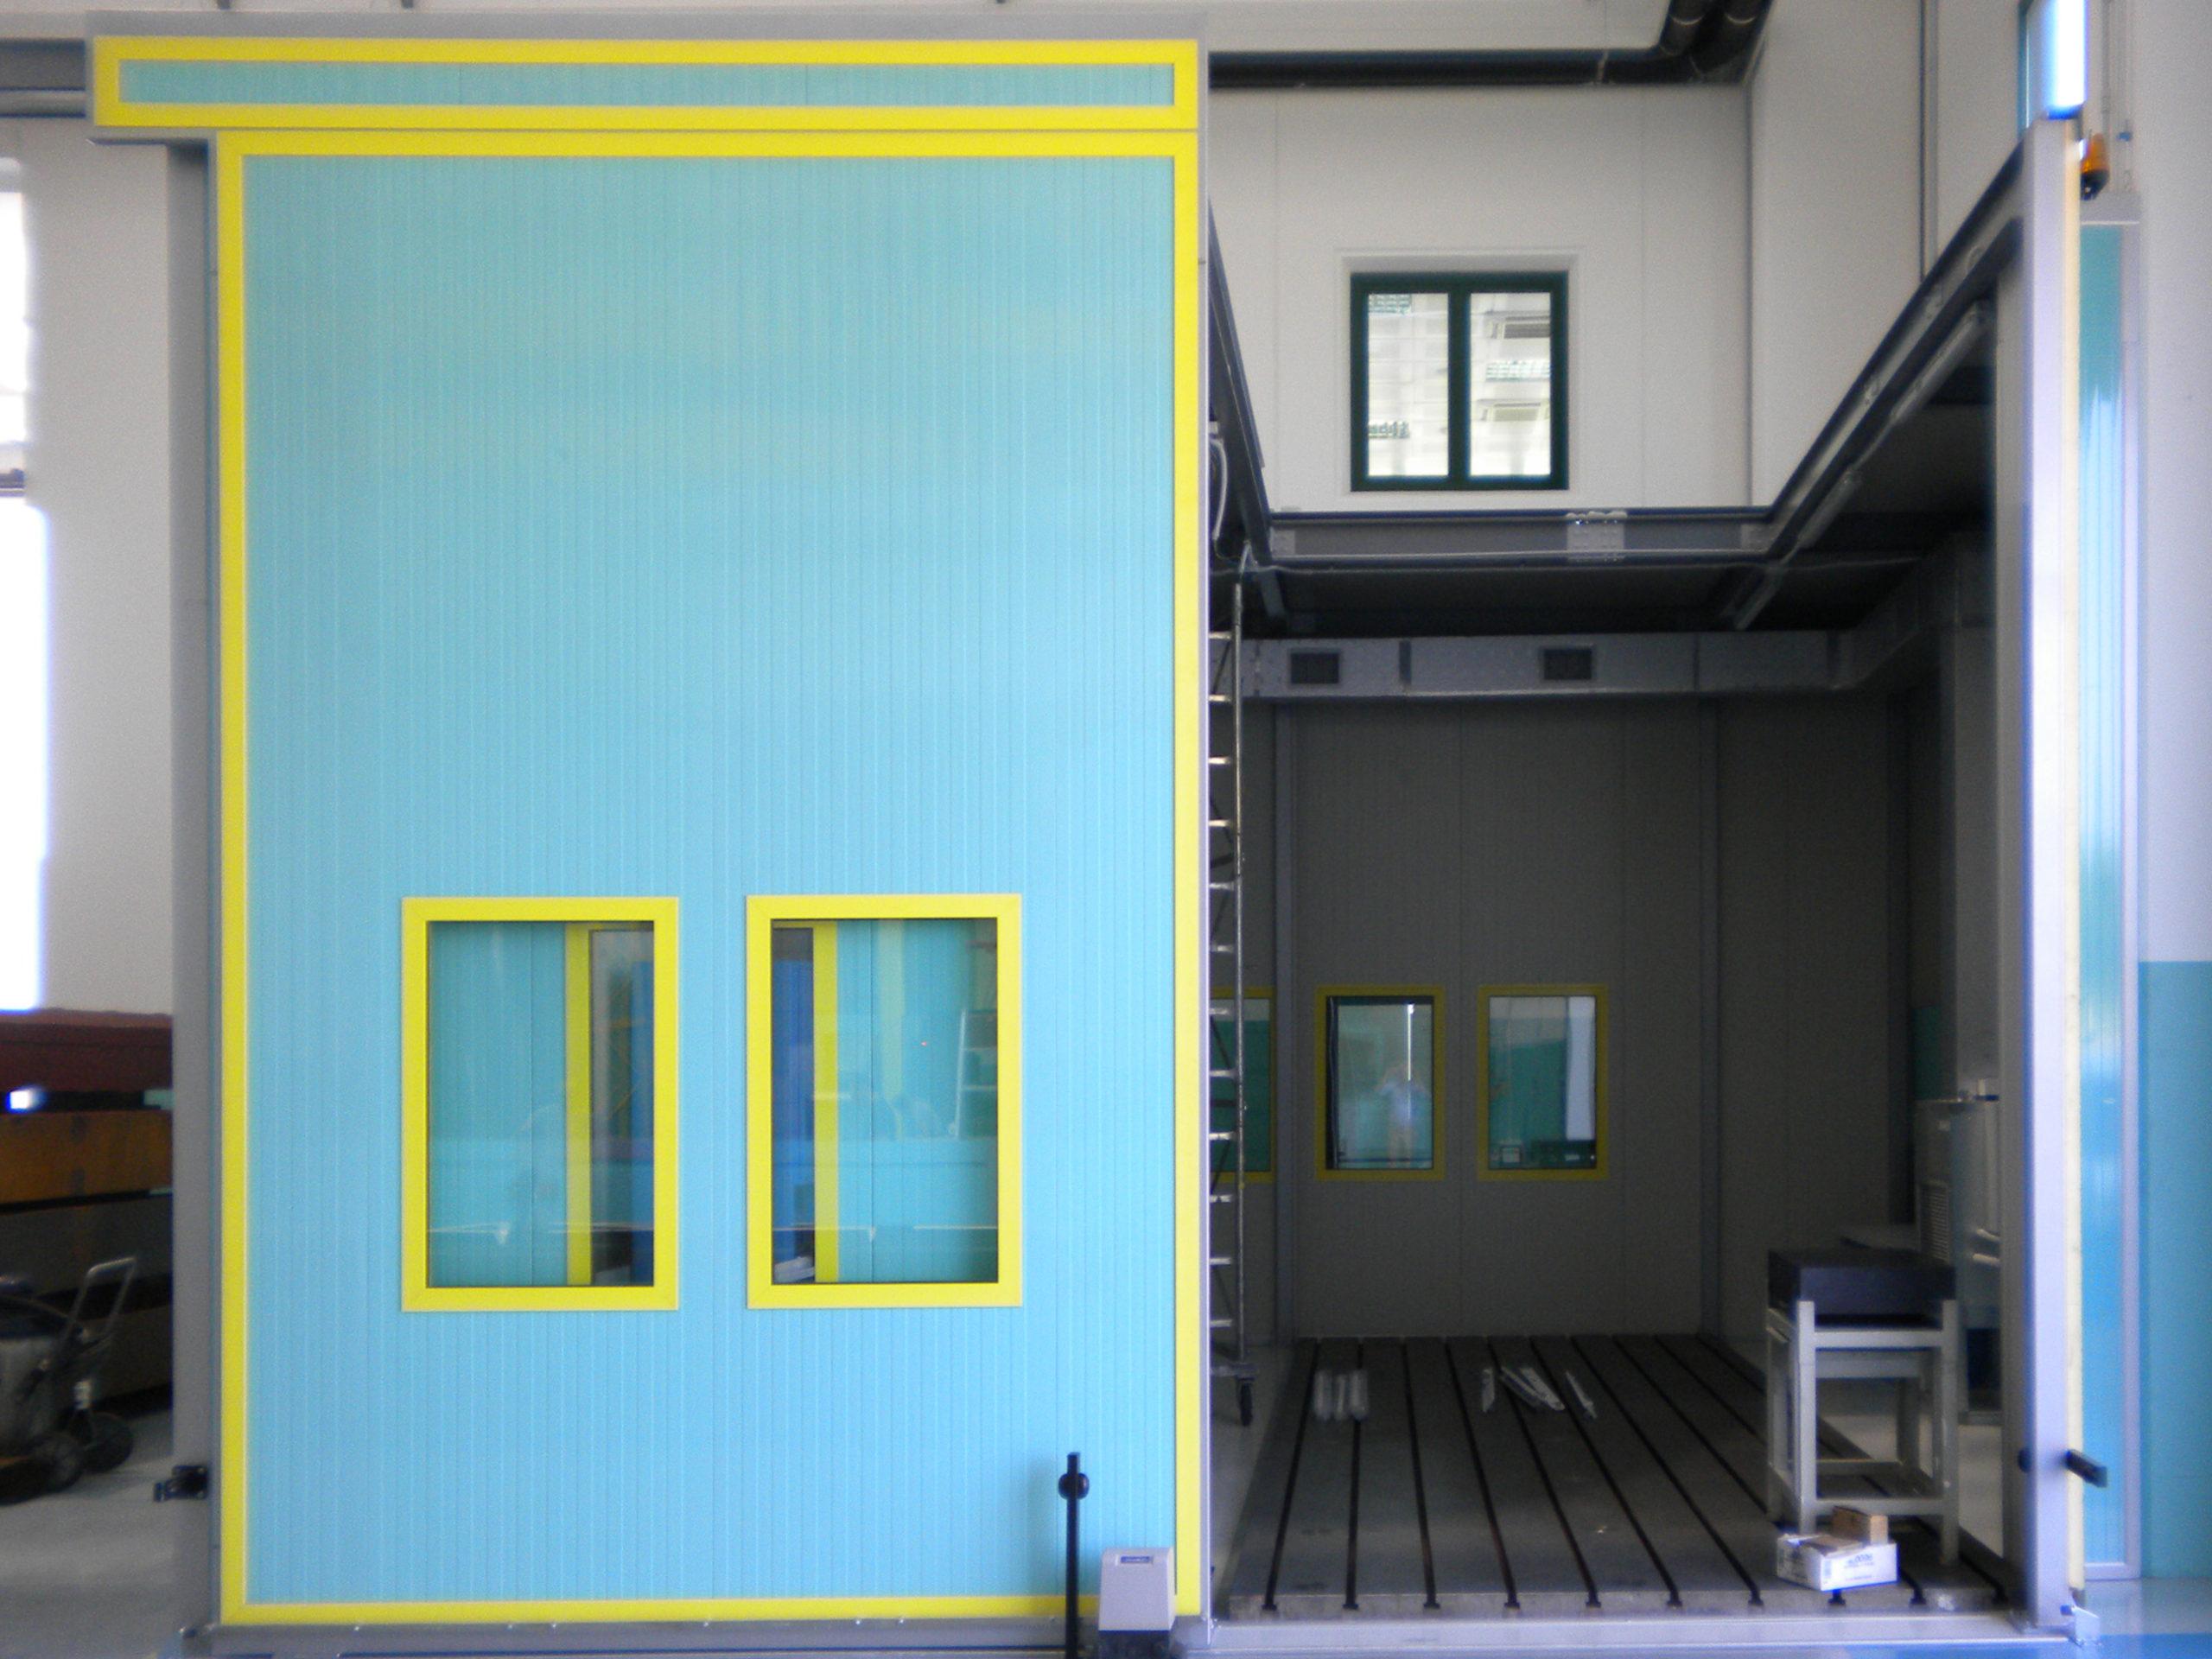 modybox_cmm_climatized_cells_cabine_climatizzate_moden_0402